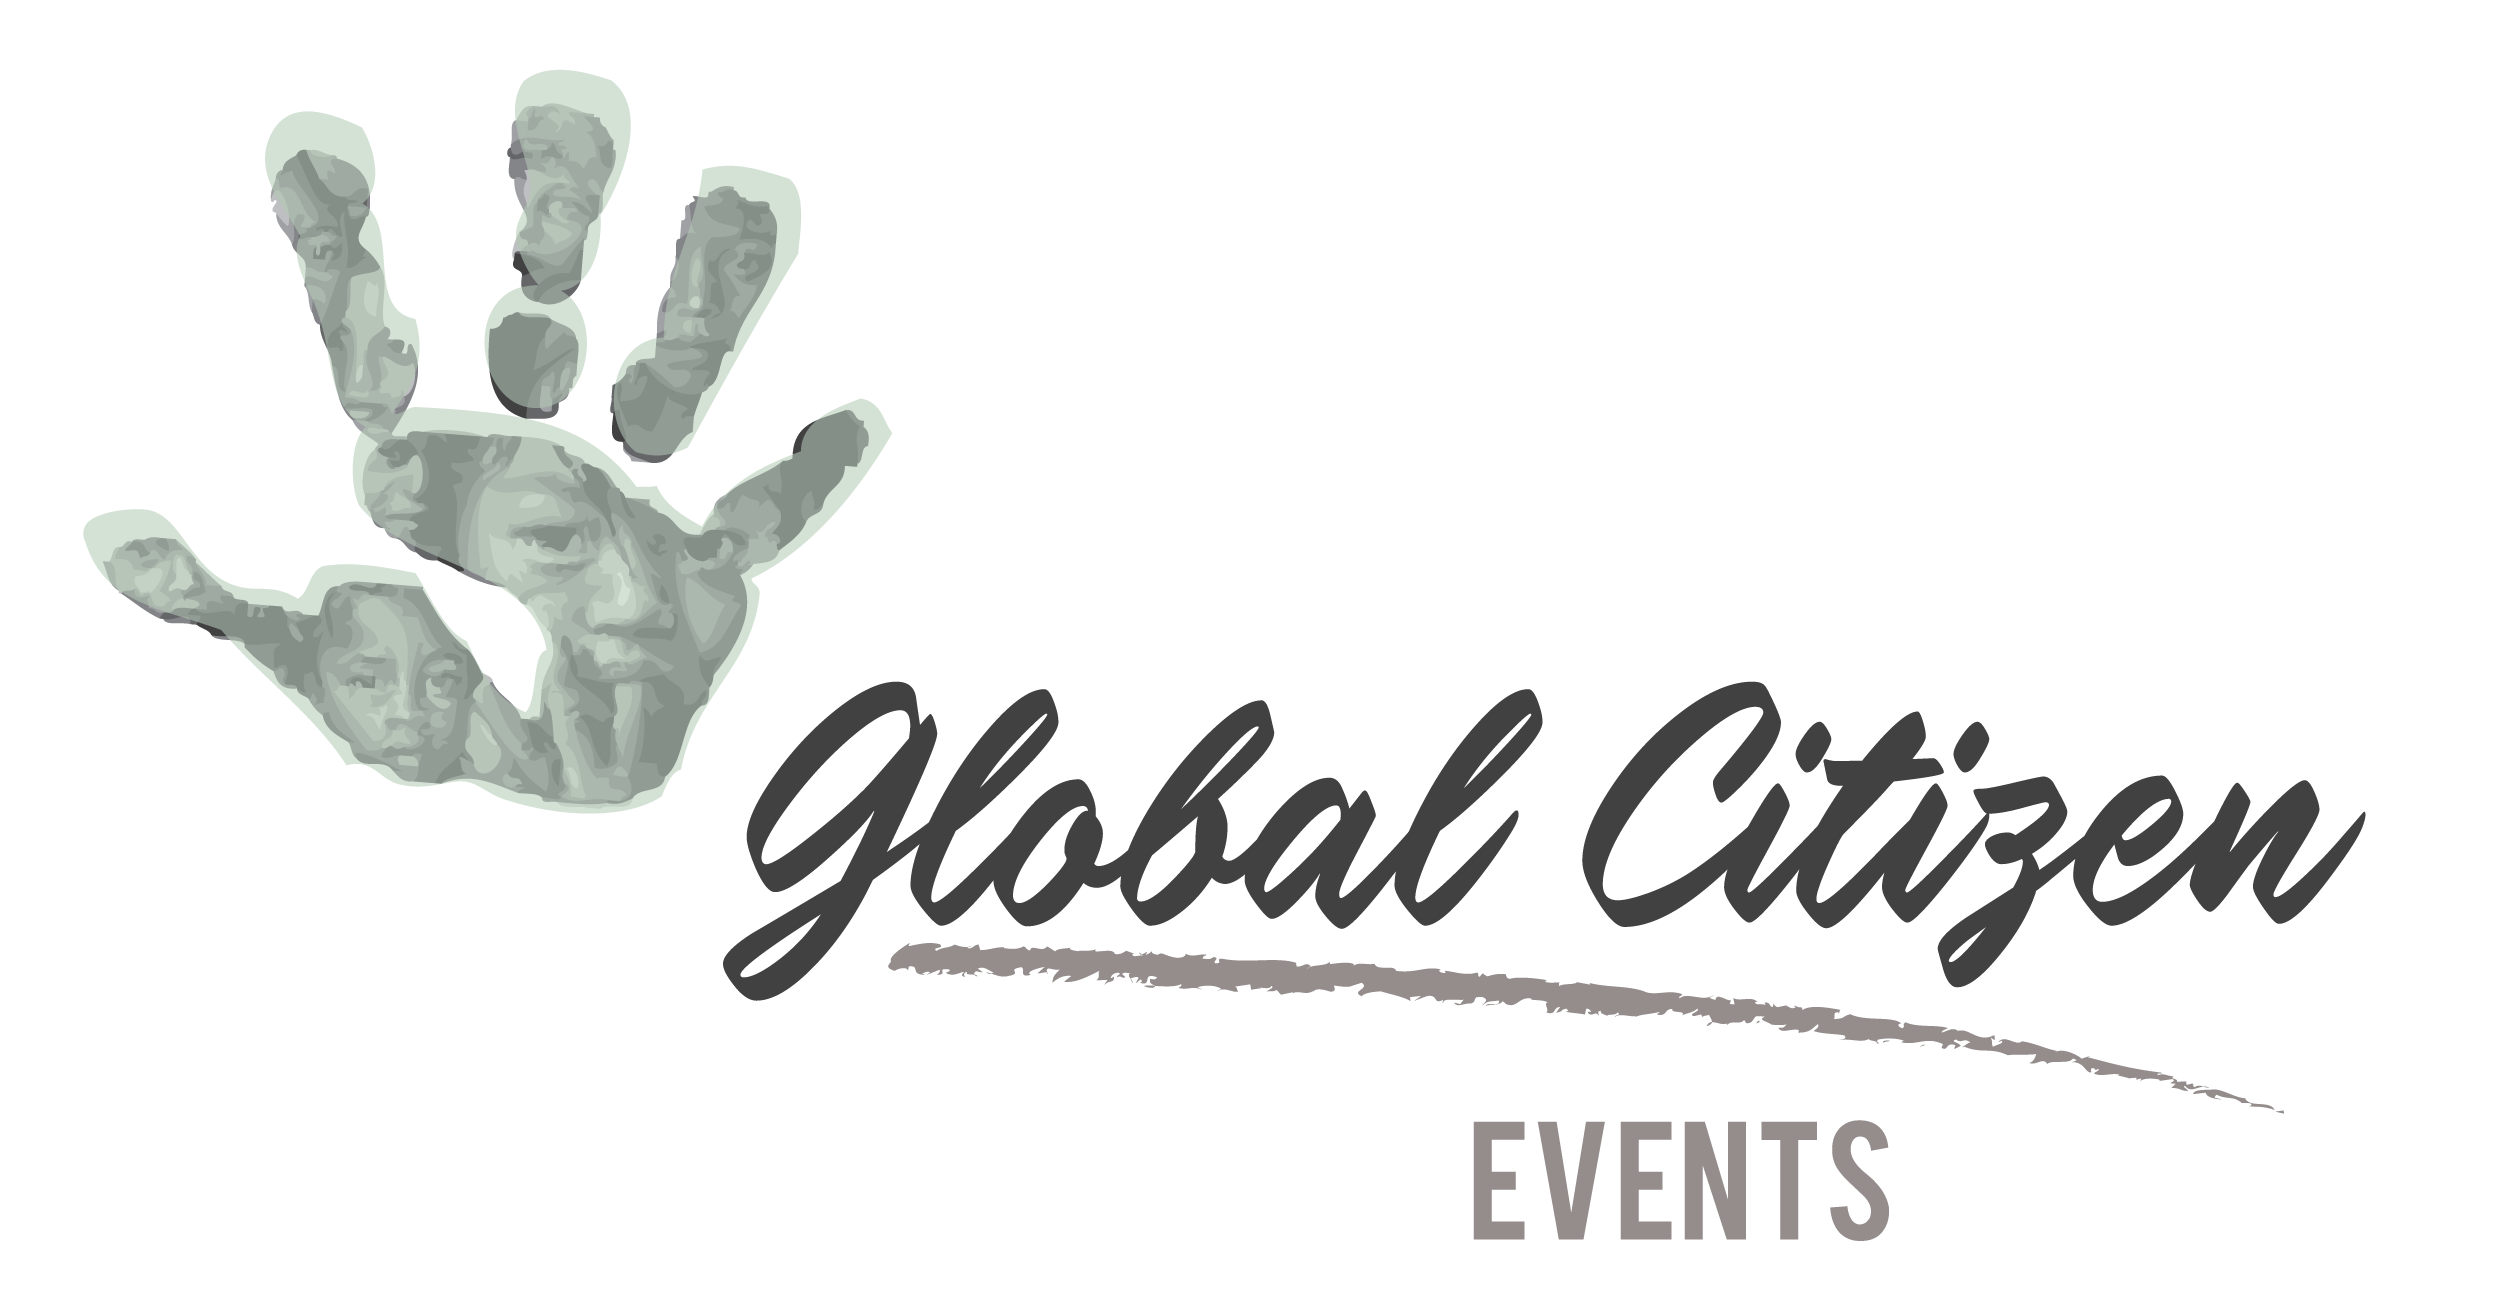 GCE-logo-large-transparent.png